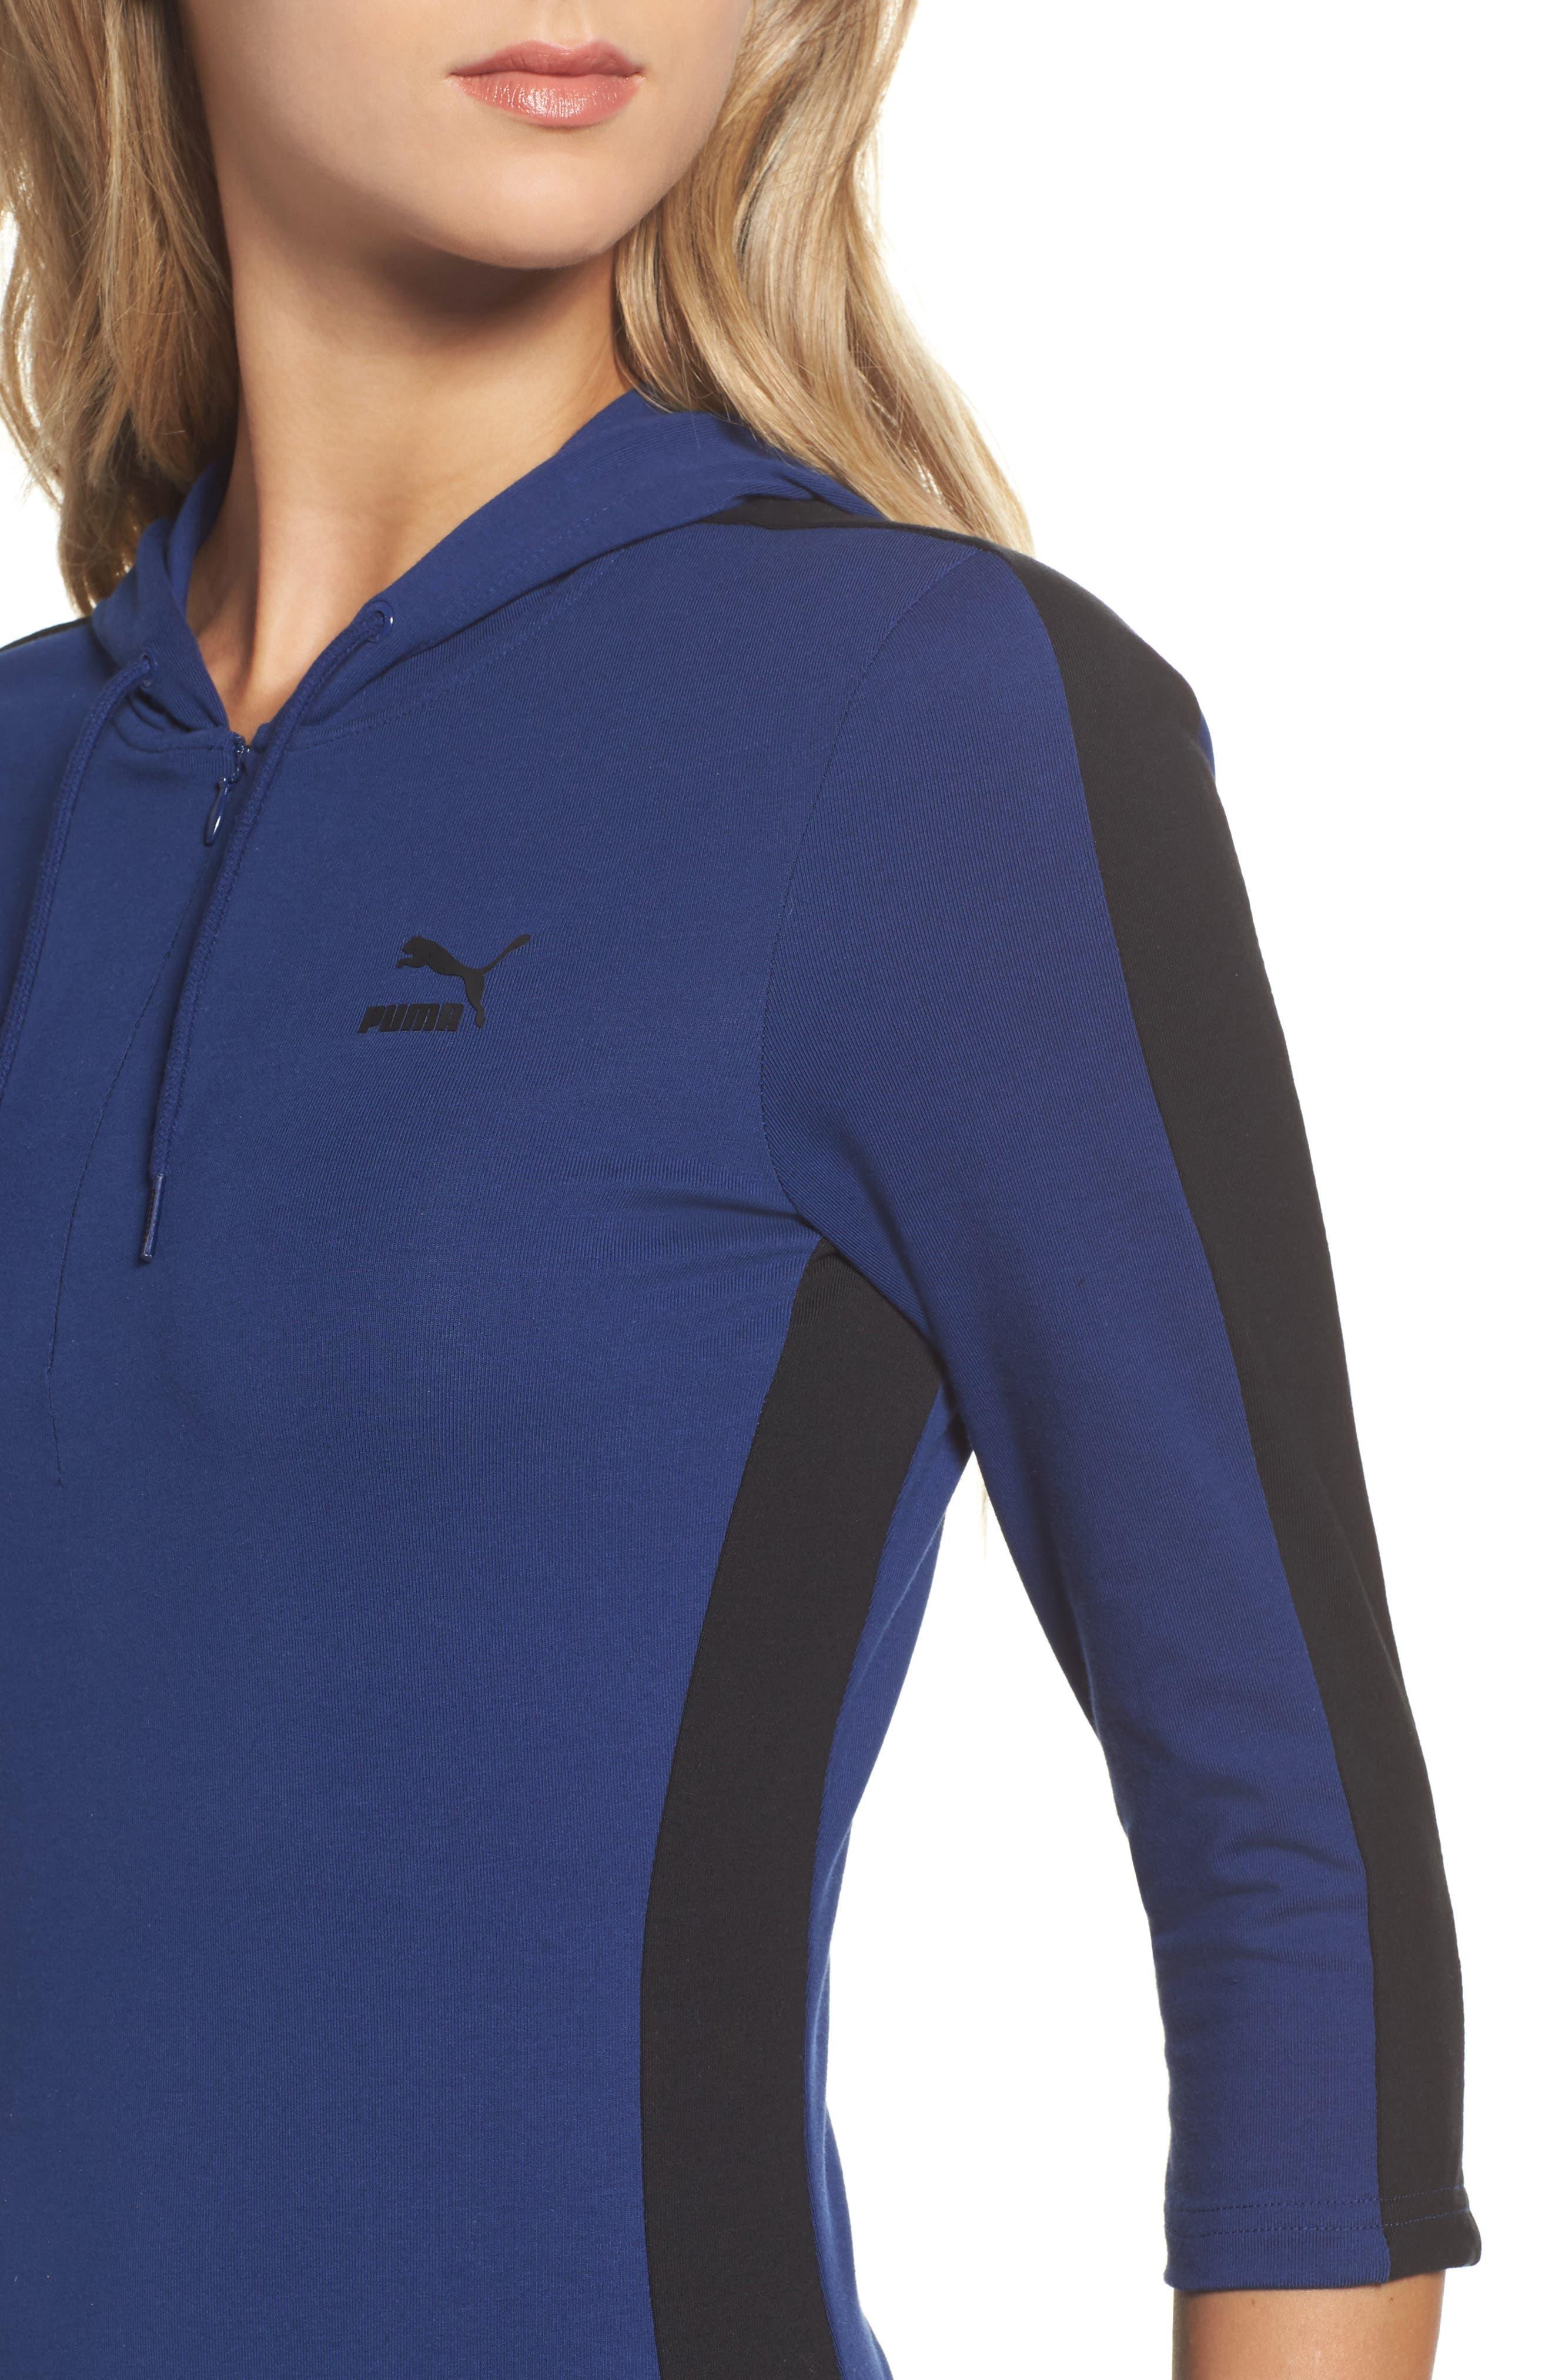 T7 Sweatshirt Dress,                             Alternate thumbnail 4, color,                             Blue Depths